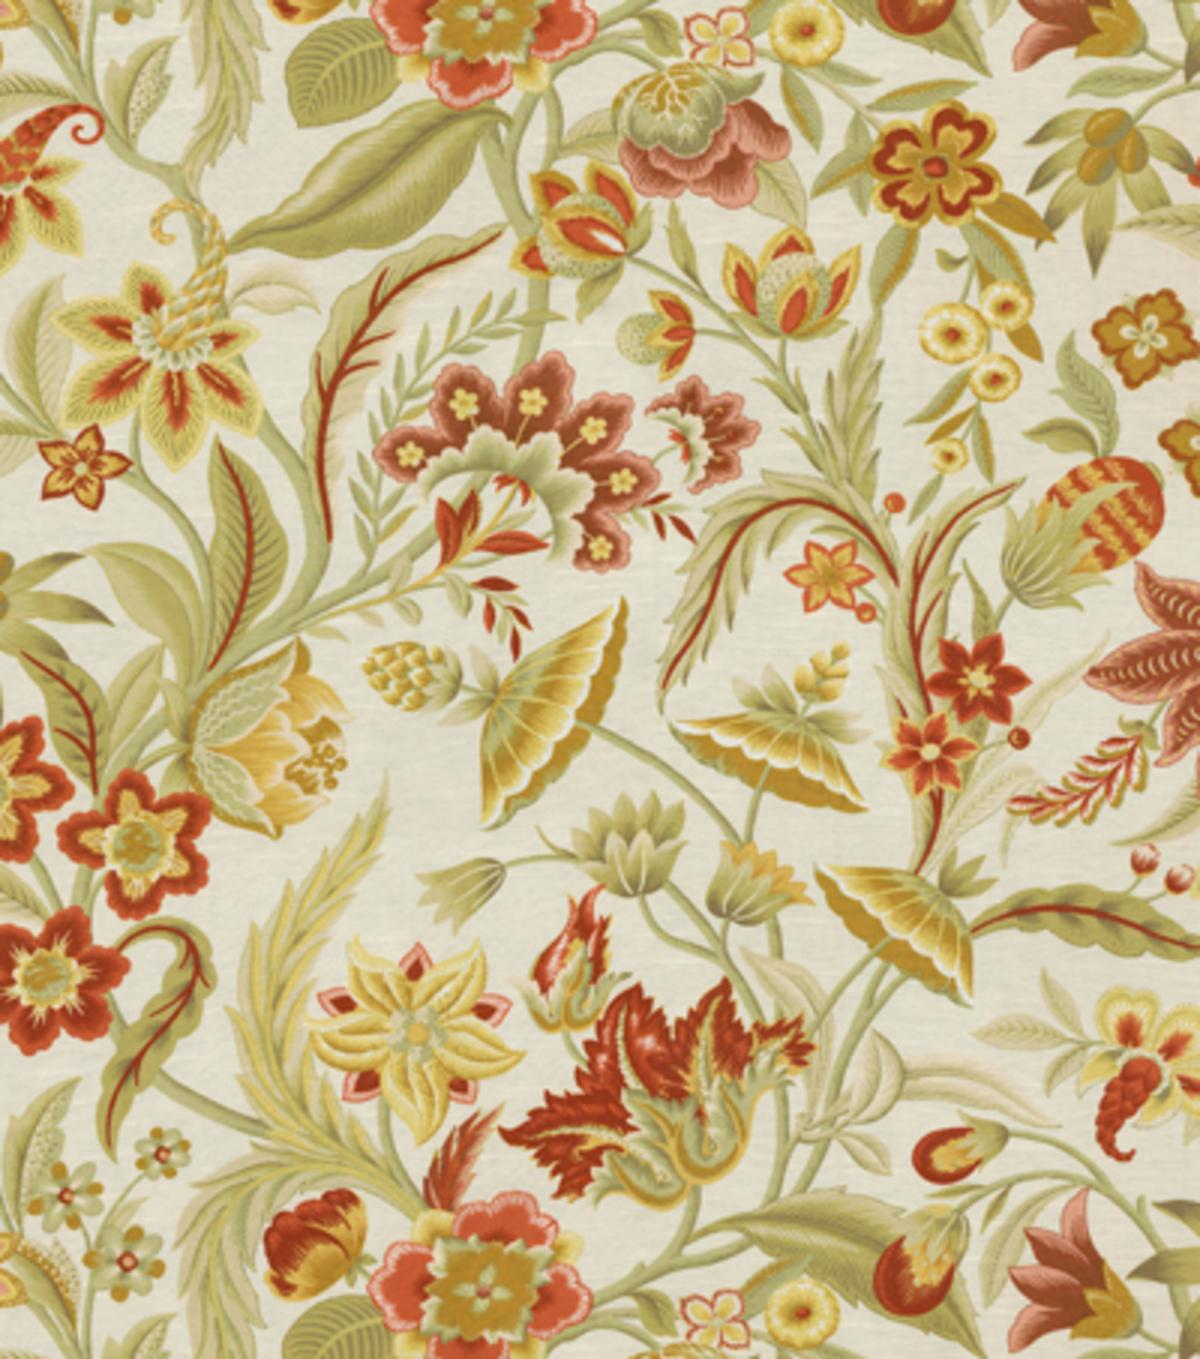 Home Decor Print Fabric- Richloom Studio Millstone Vintage | JOANN